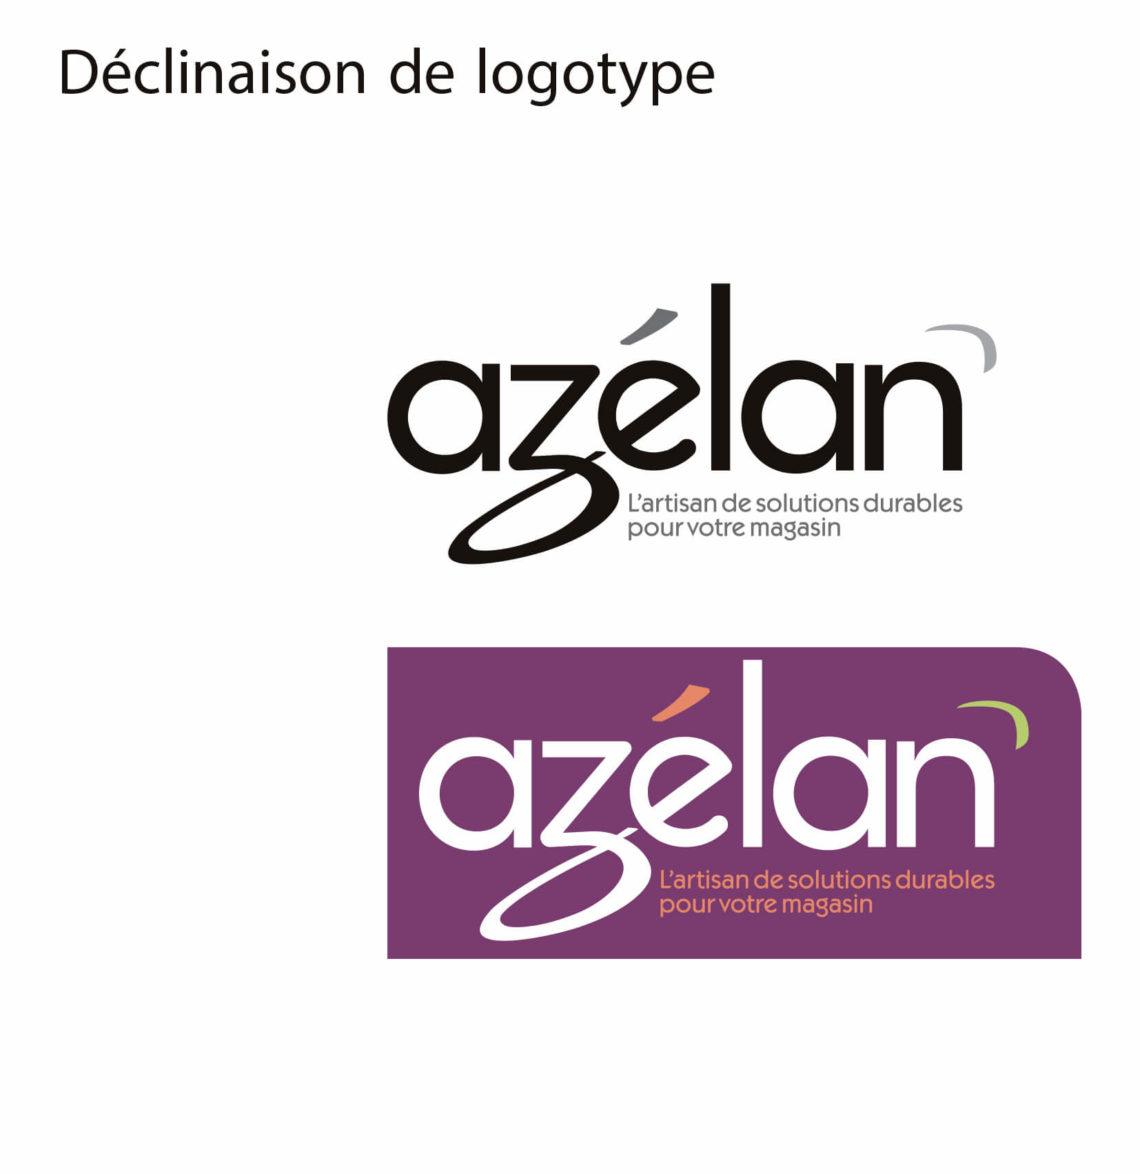 déclinaison logotype Azelan - Agence IS COMMUNICATION NANTES